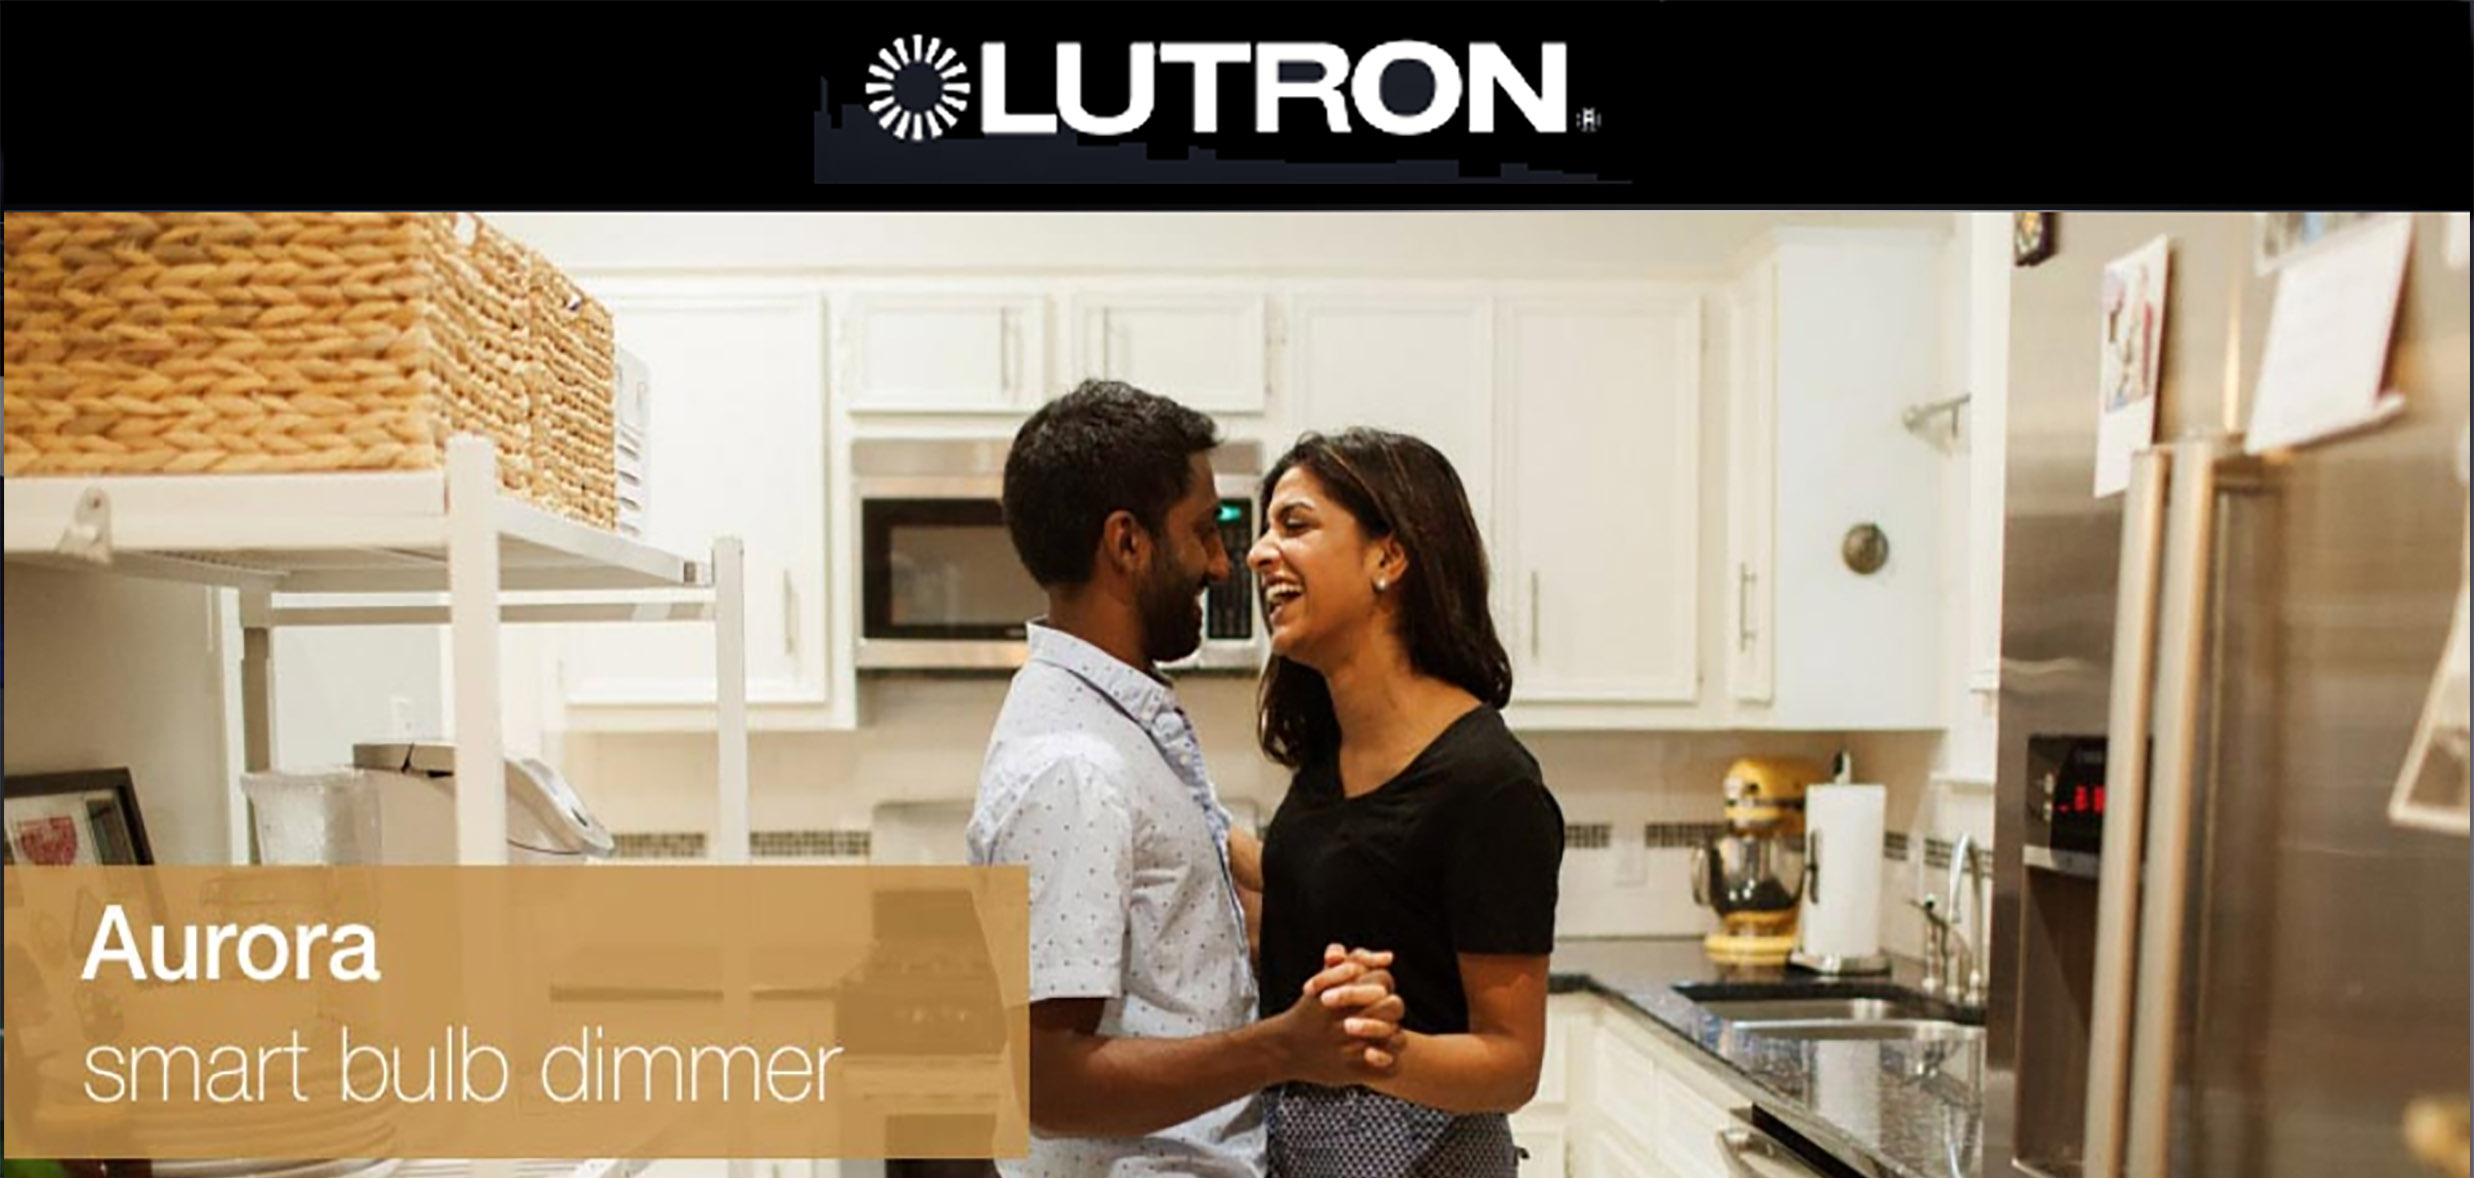 Lutron3xx